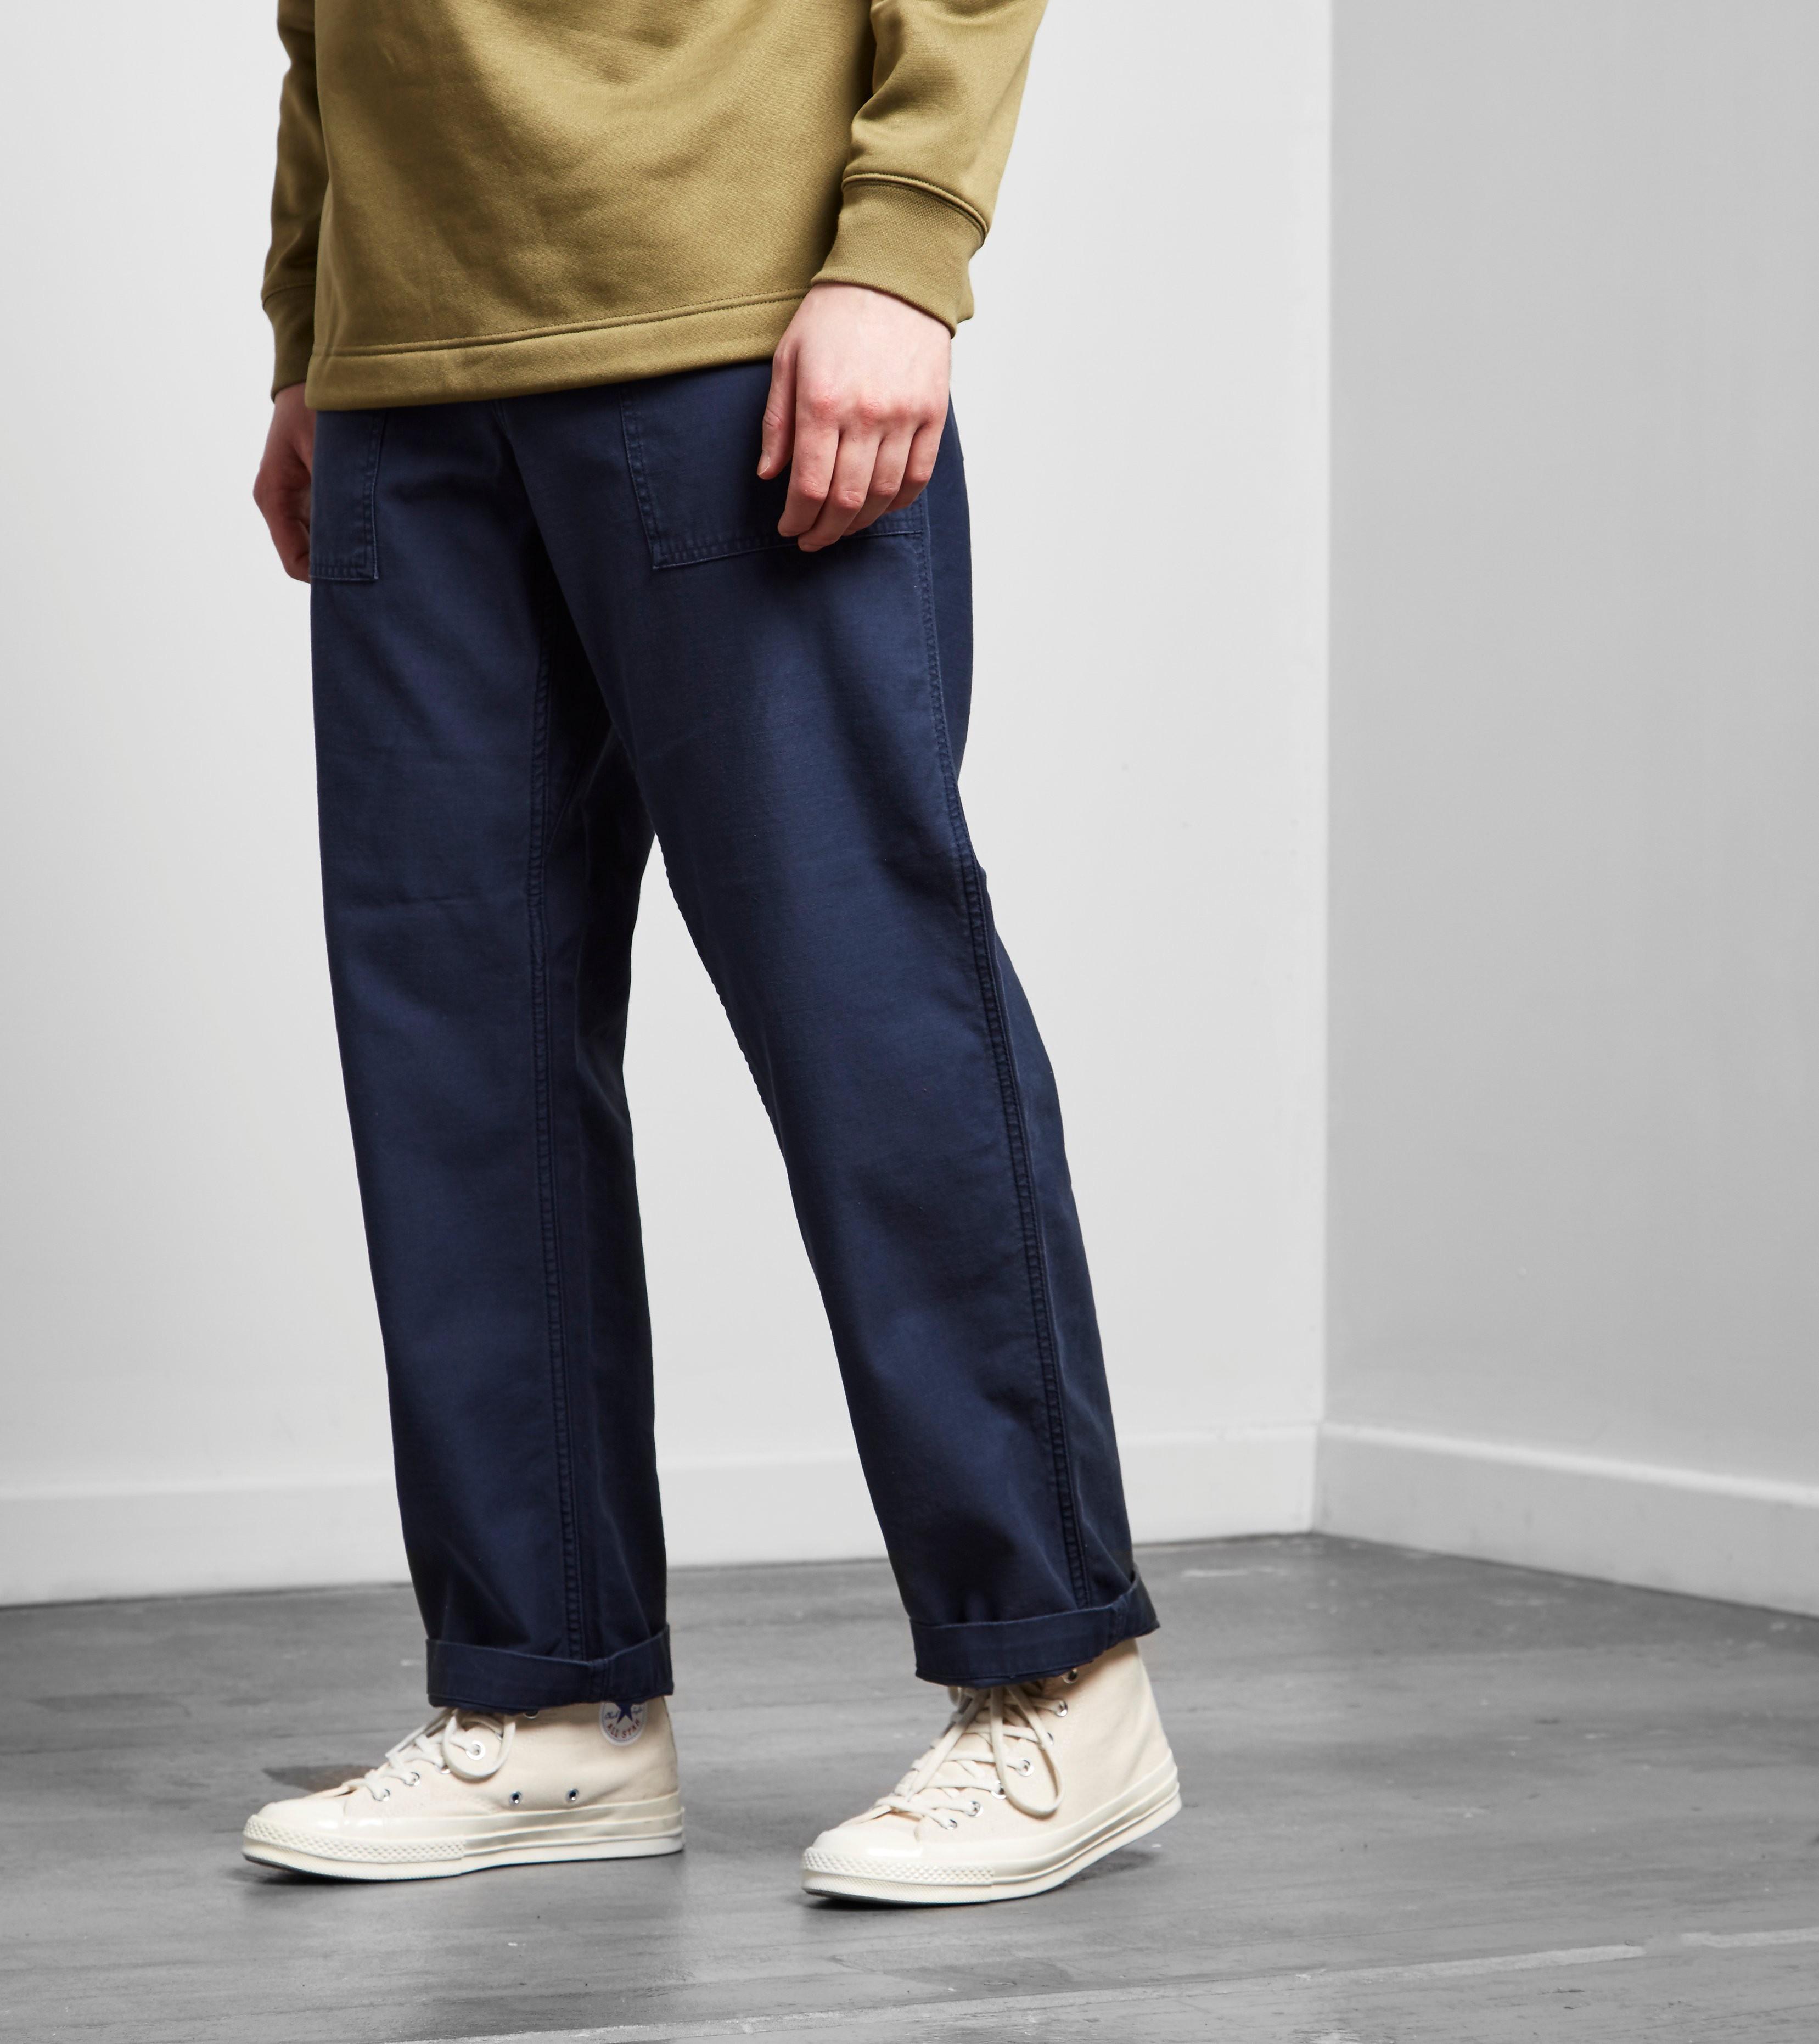 Carhartt WIP Fatigue Trousers